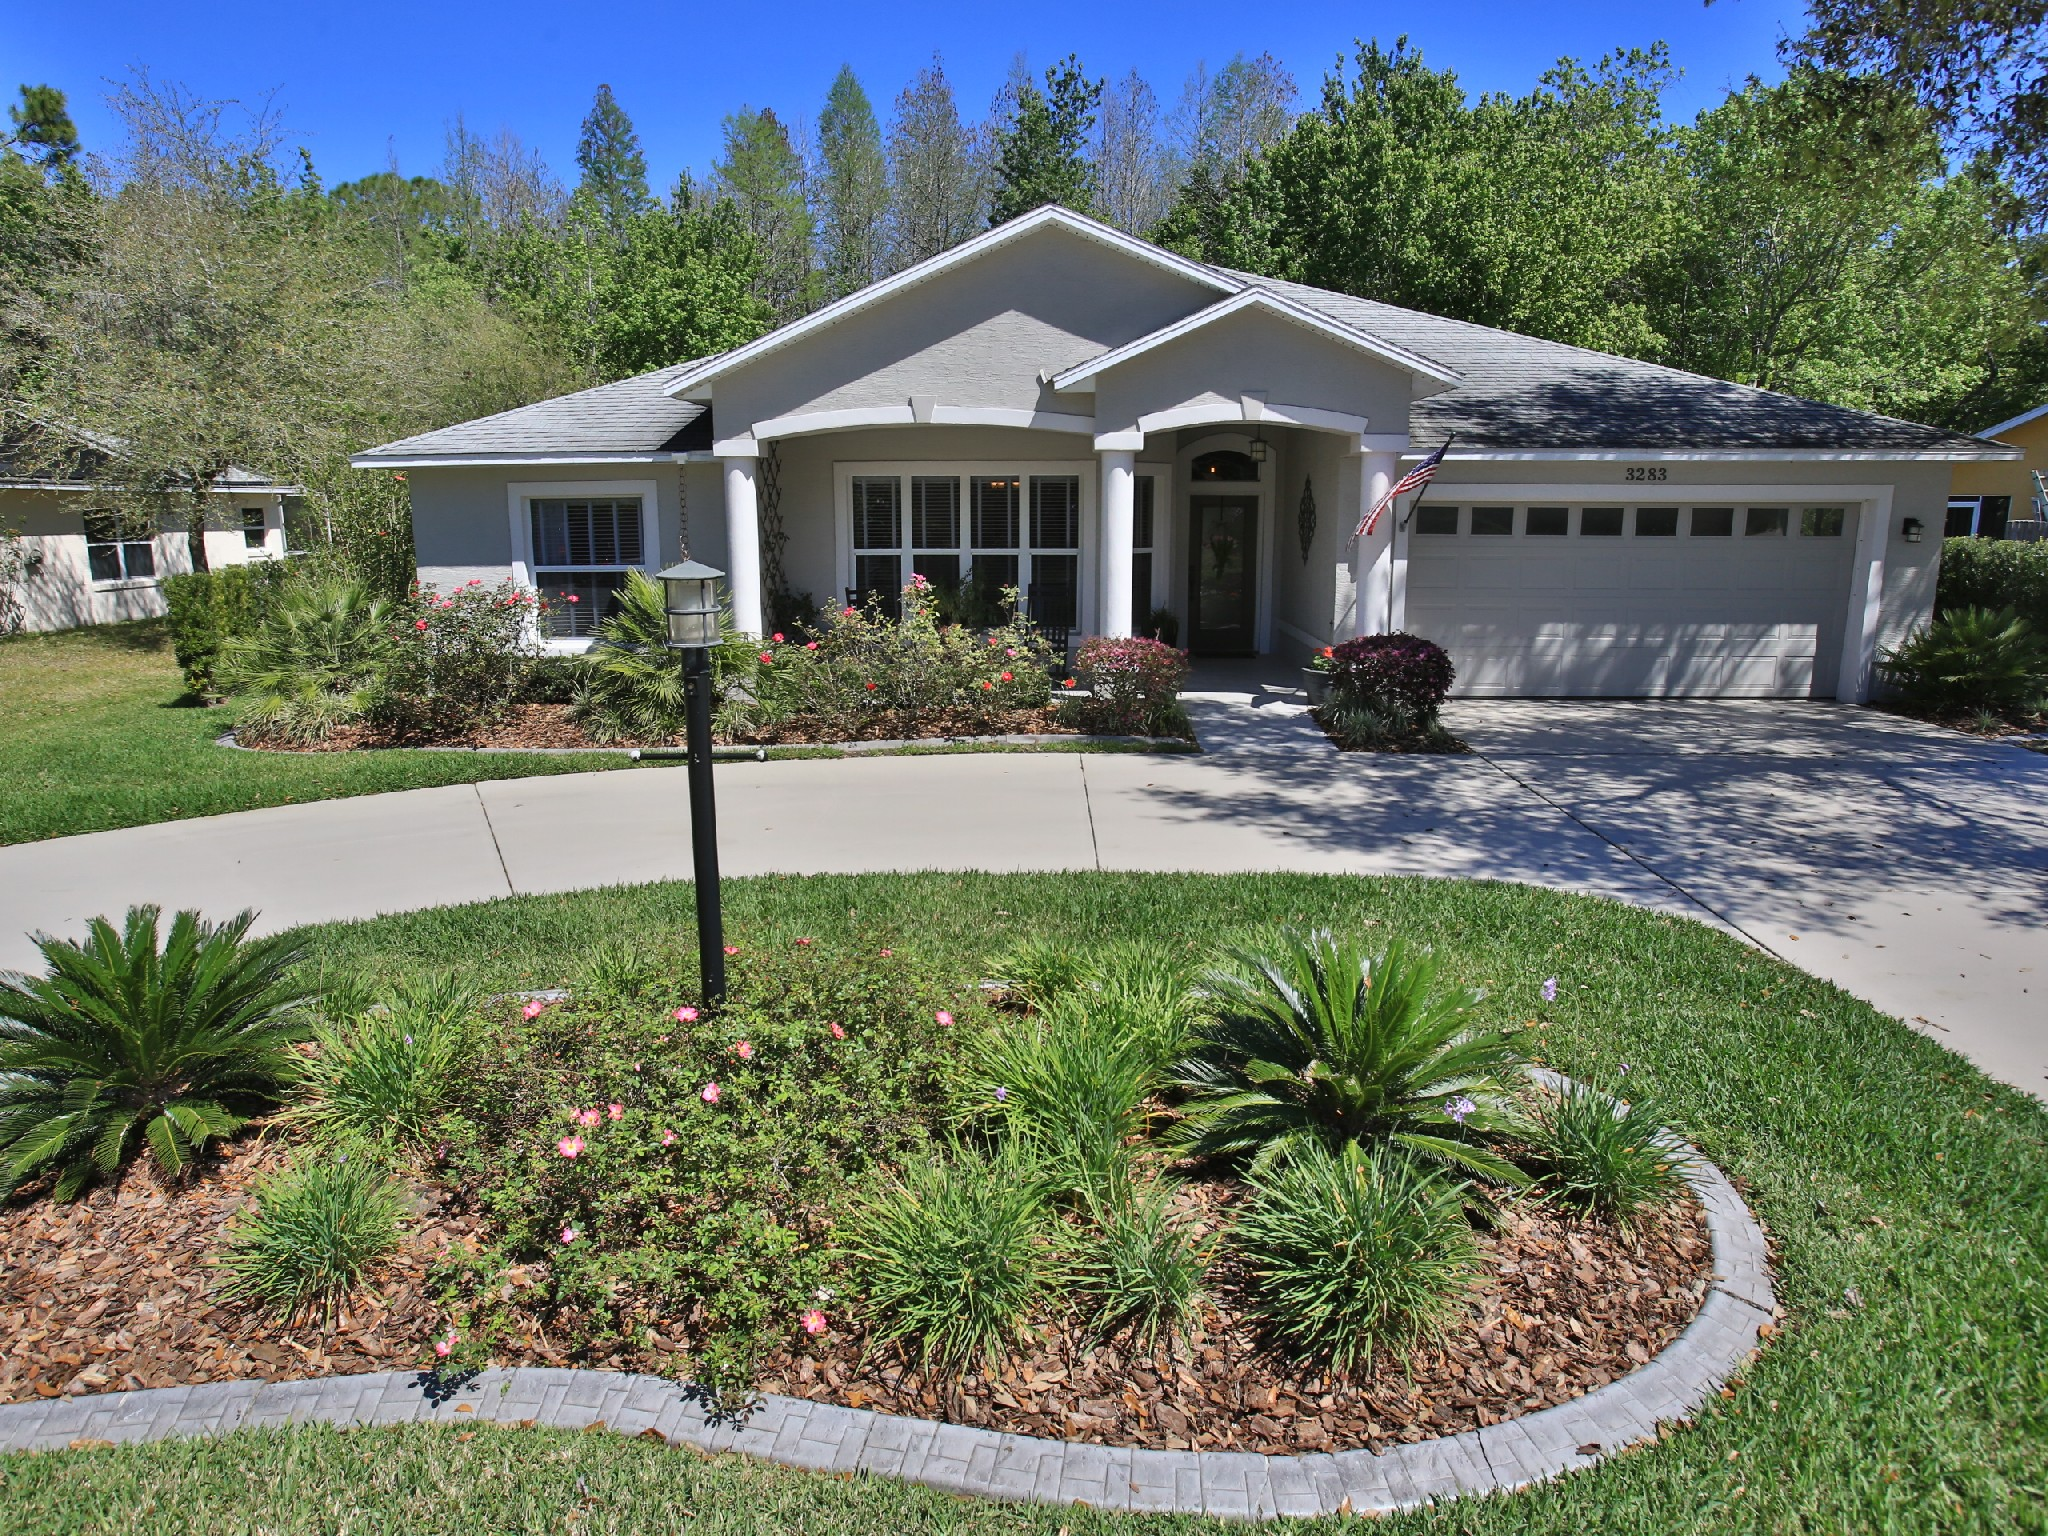 Single Family Home for Sale at Daytona Beach, Florida 3283 Spruce Creek Glen Port Orange, Florida 32128 United States